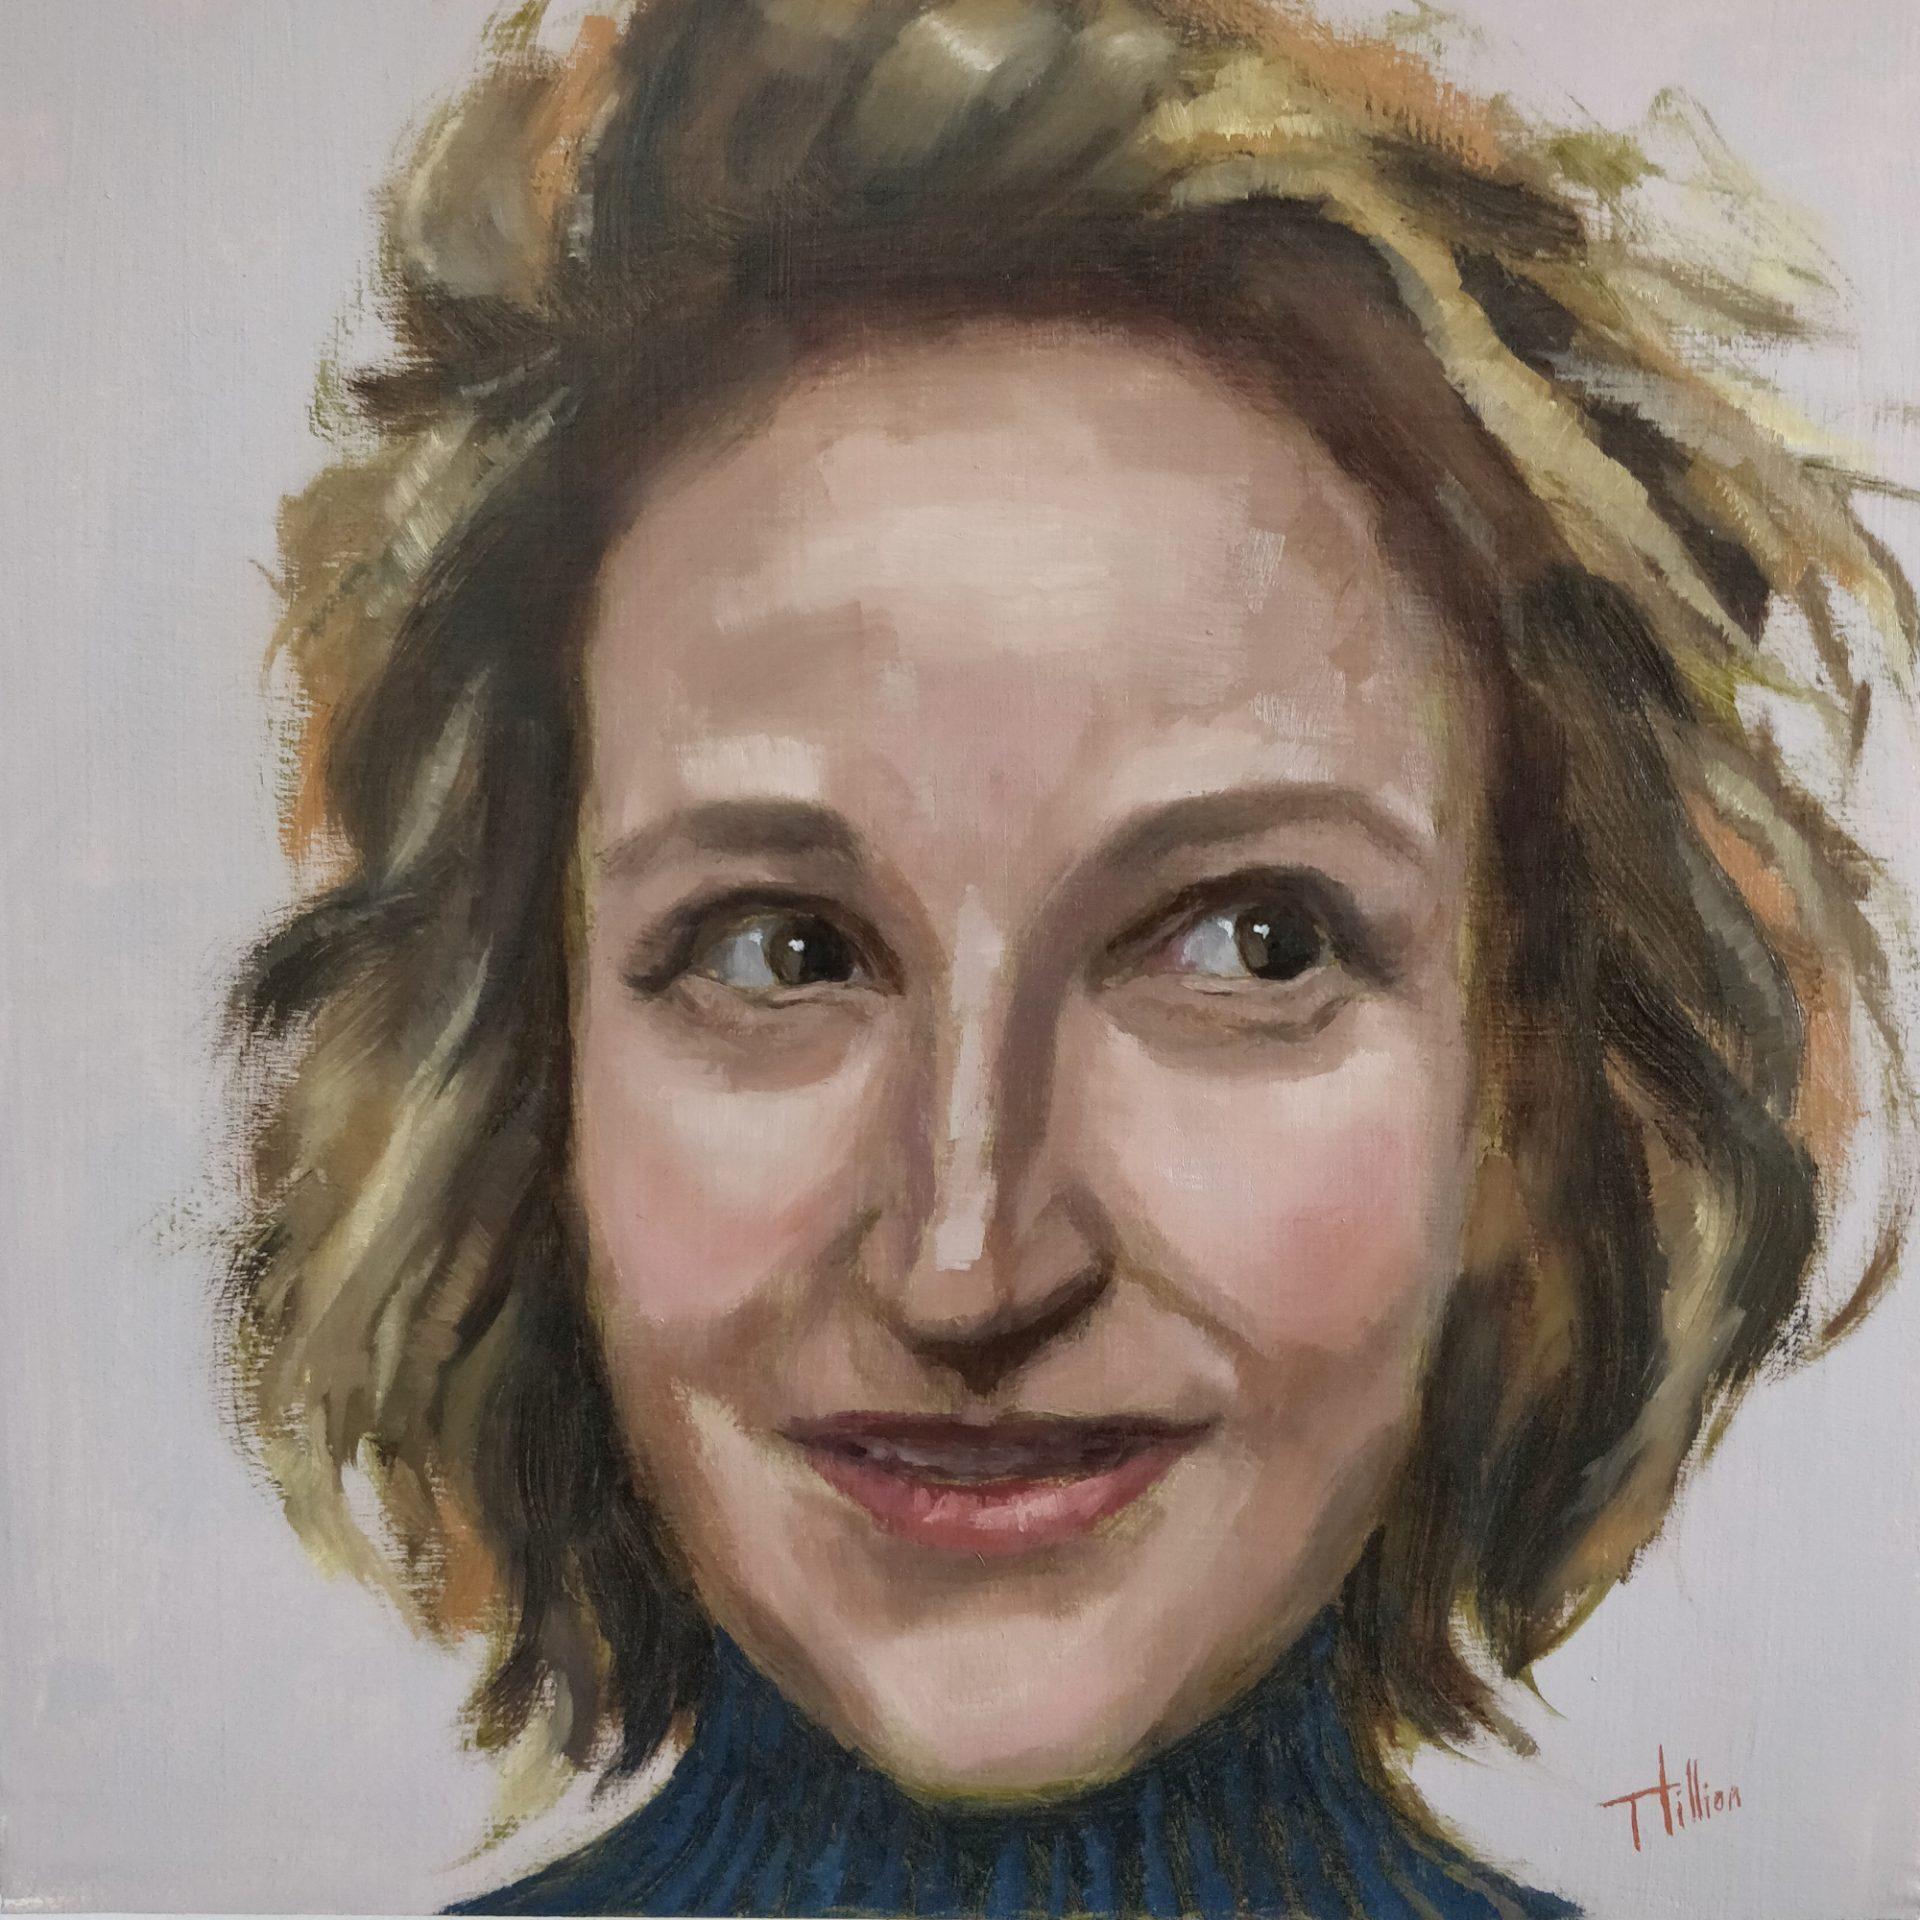 Camille Moingeon portrait by Tania Hillion